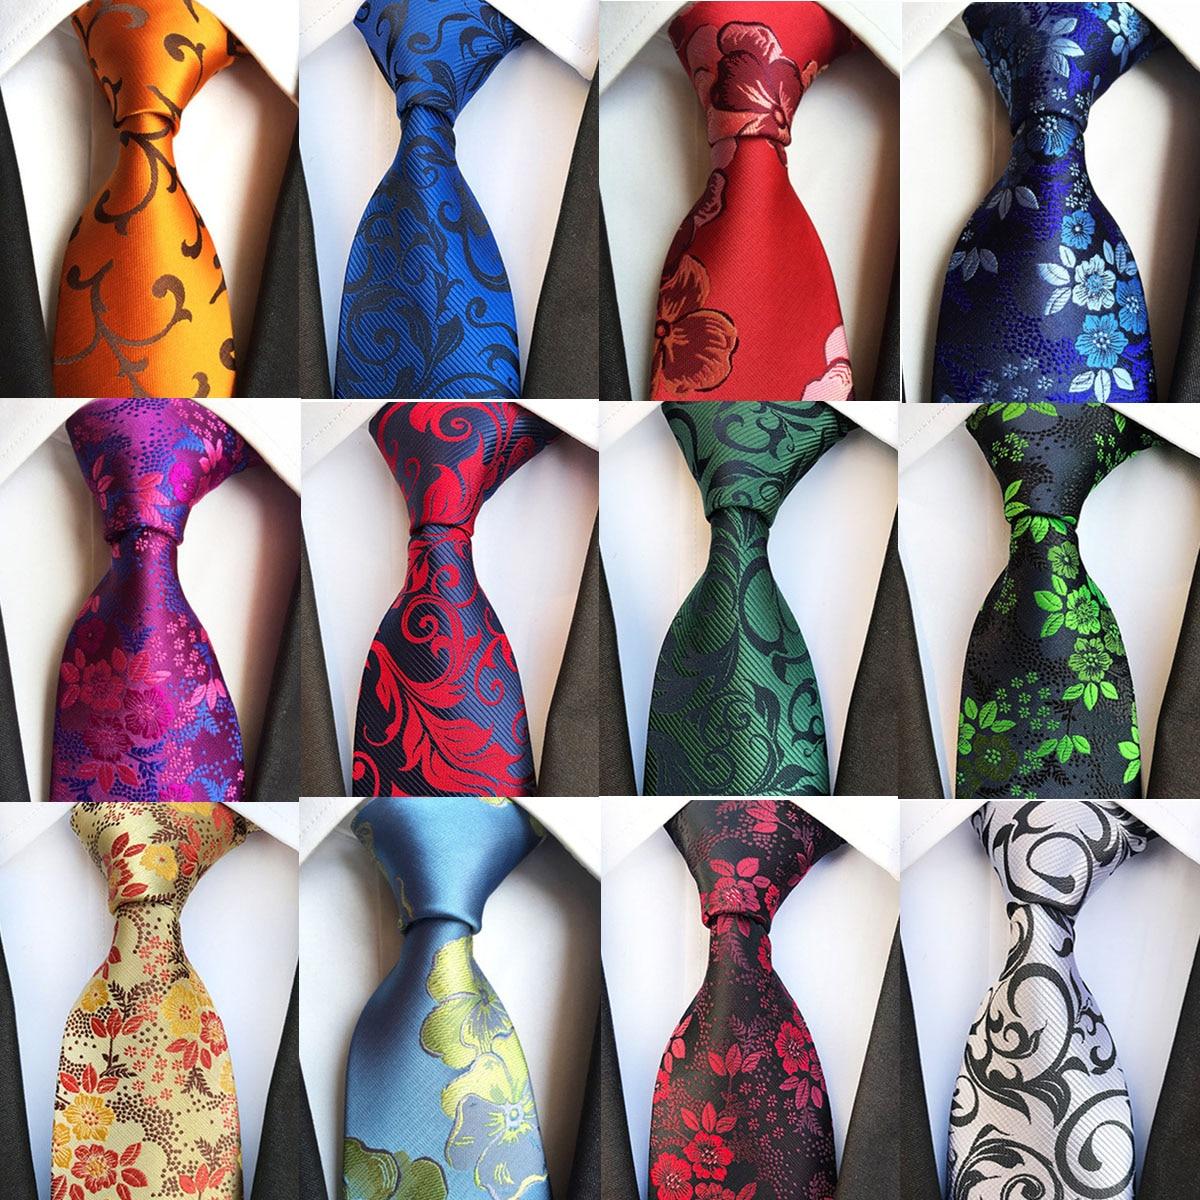 Neue Mode 8cm Silk herren Blumen Krawatte Grün Bule Jucquard Krawatte Anzug Männer Business Hochzeit Party Formale Neck krawatten Geschenke Krawatte